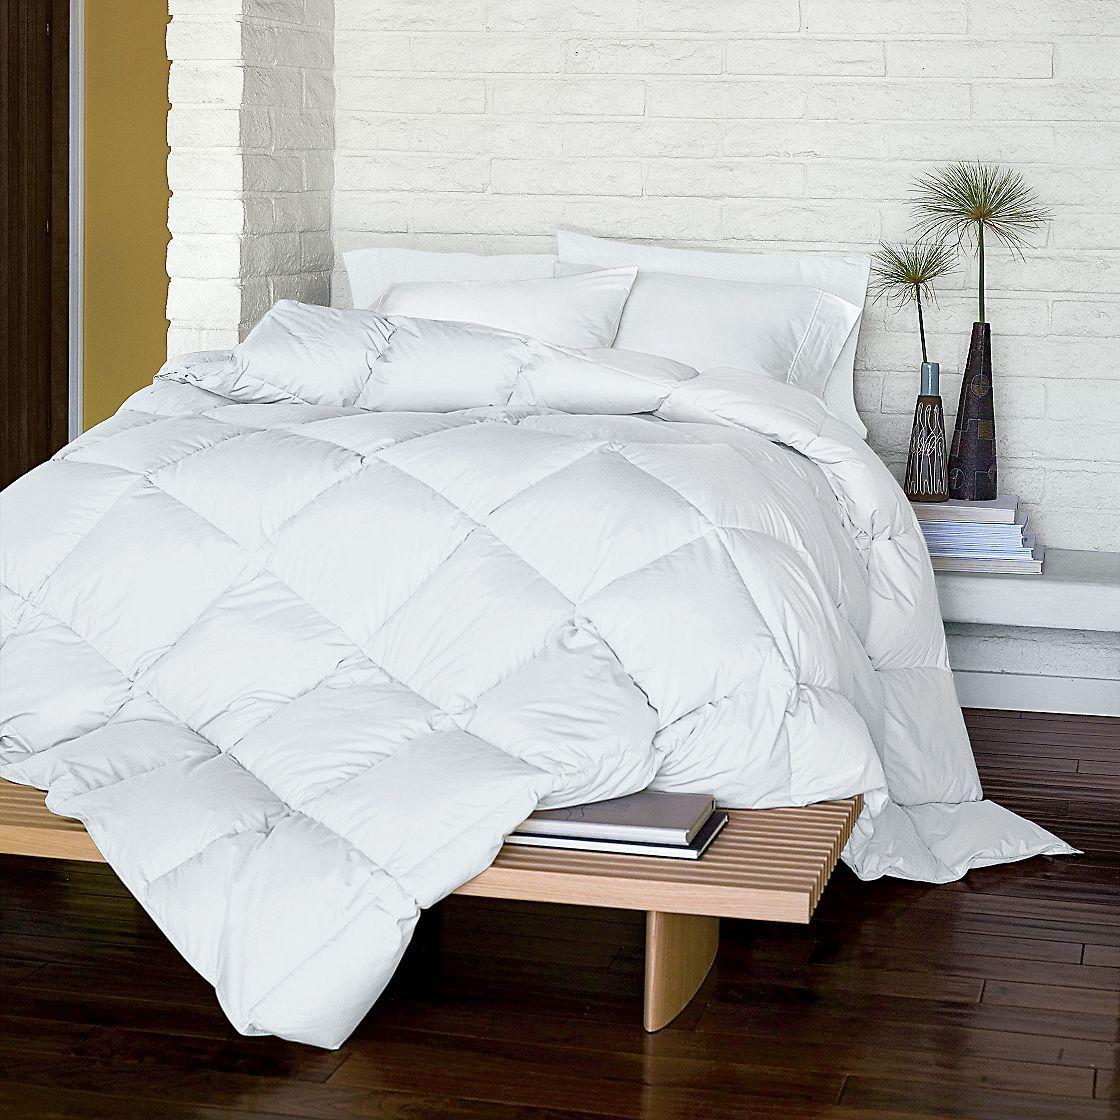 Riley S Duvet Insert La Crosse Primaloft Deluxe Down Alternative Comforter The Company